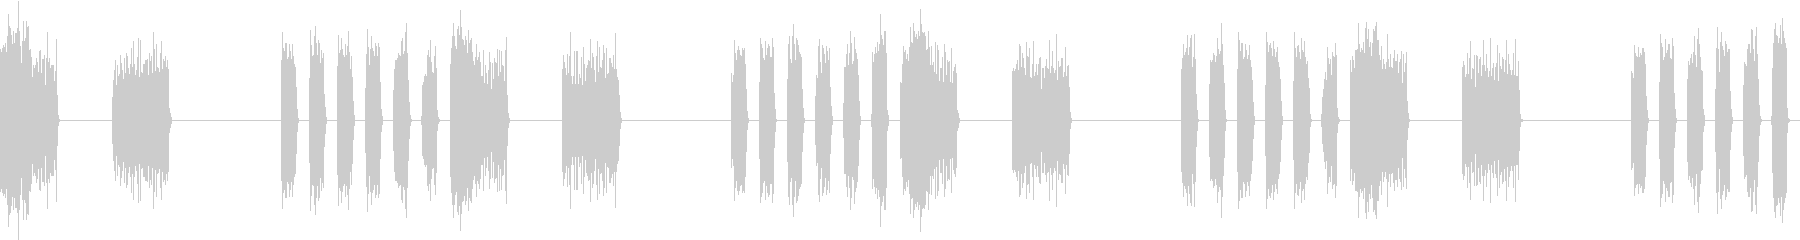 SFX デジタルボイスの不気味なループの未再生の波形